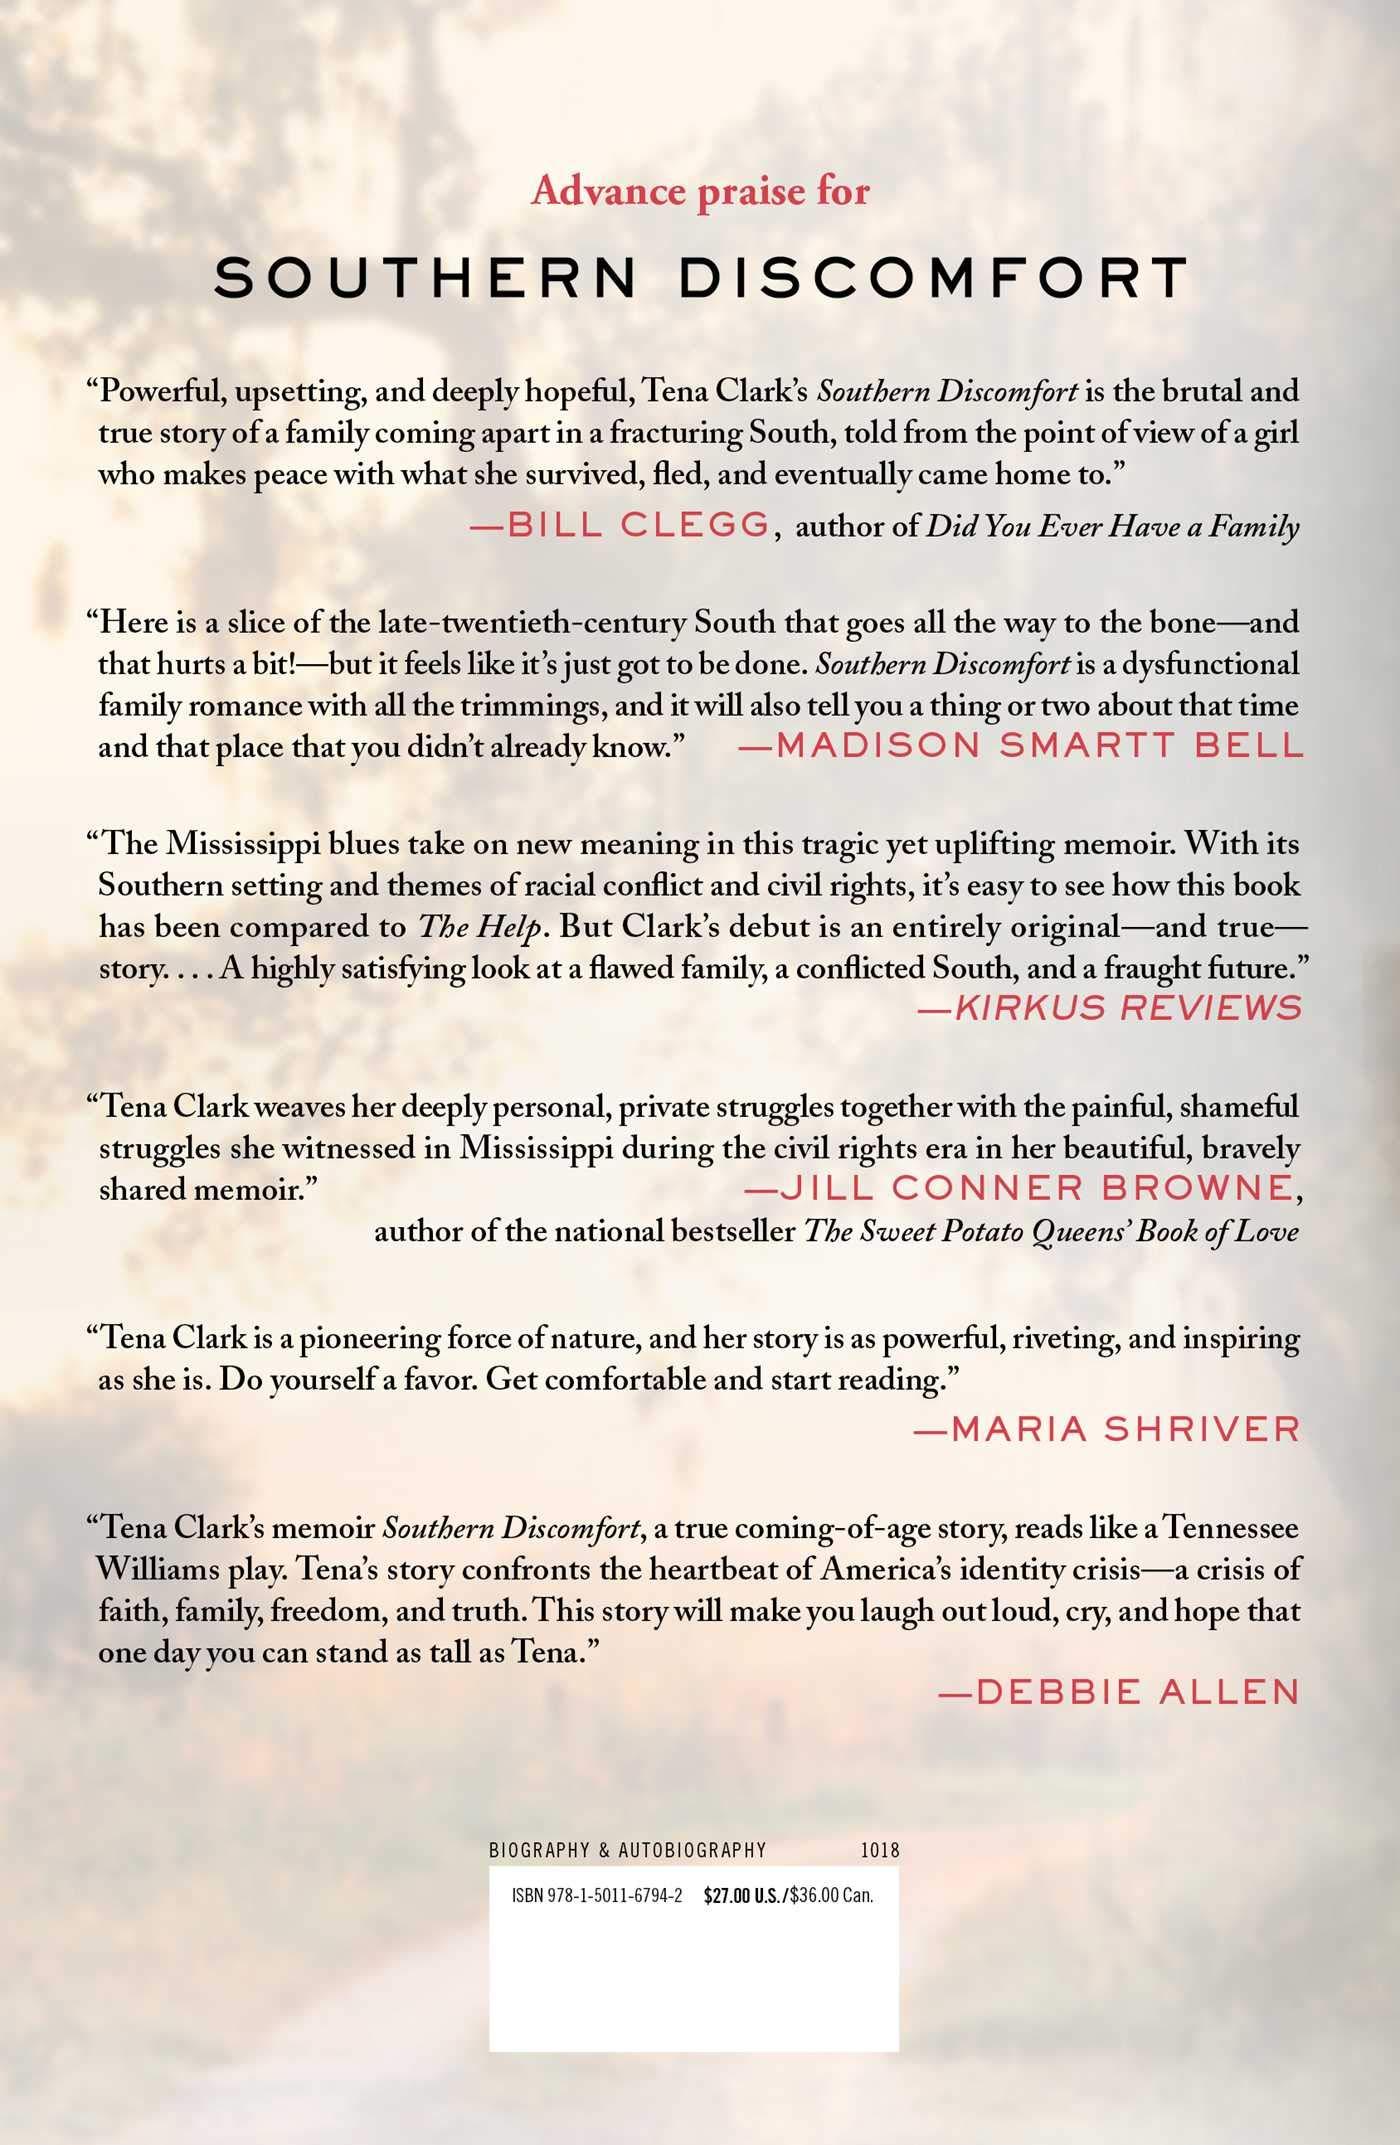 Southern Discomfort: A Memoir: Tena Clark: 9781501167942 ...